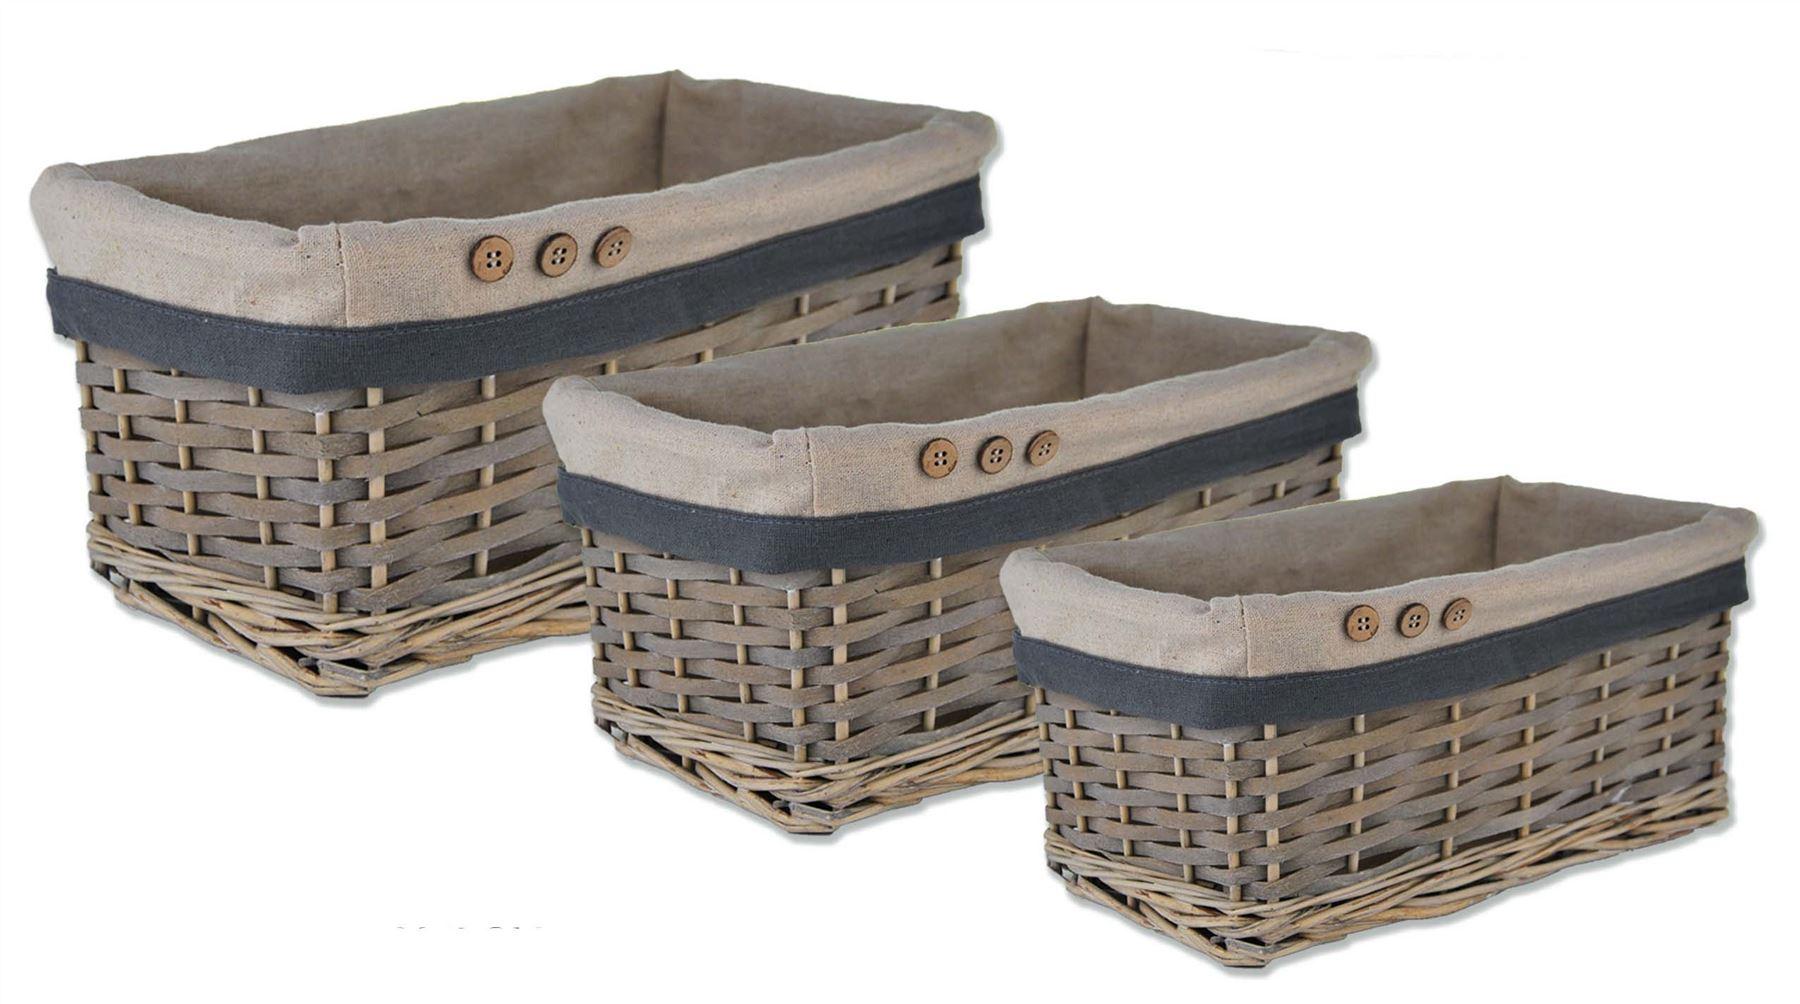 Storage Wicker Willow Lined Basket Bread Fruit Hamper Holder Kitchen Bathroom Ebay